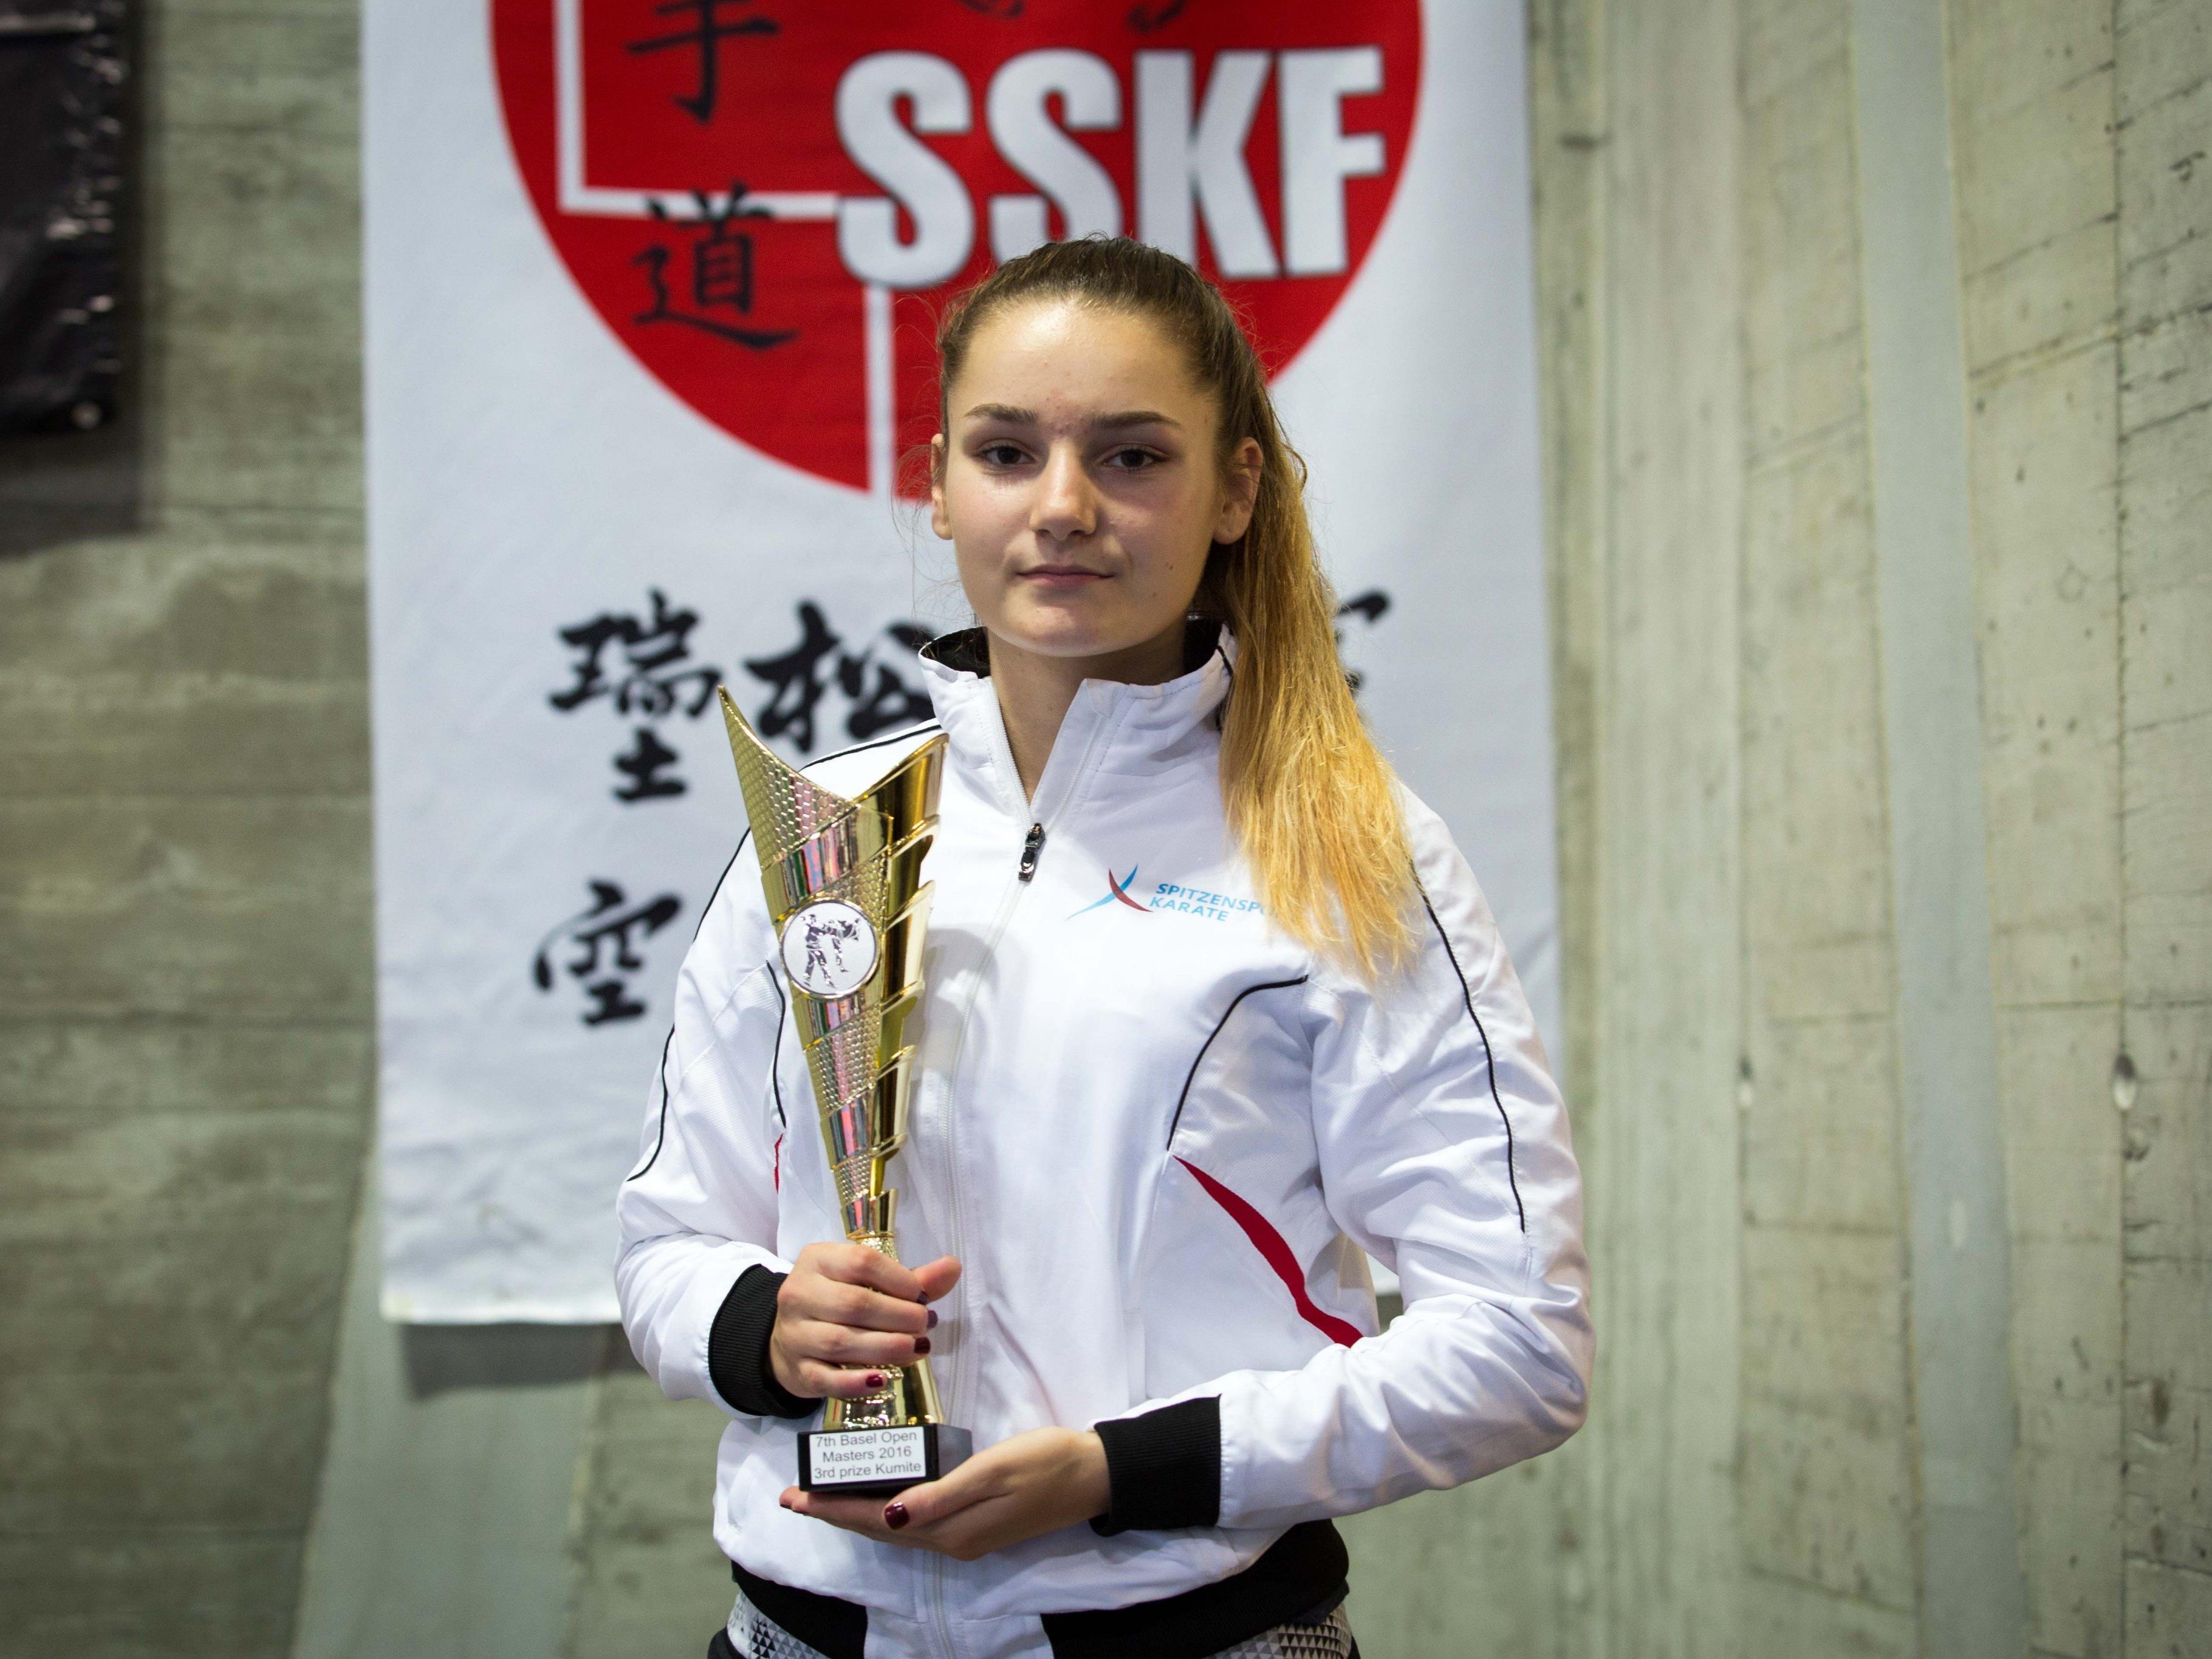 Marijana Maksimovic